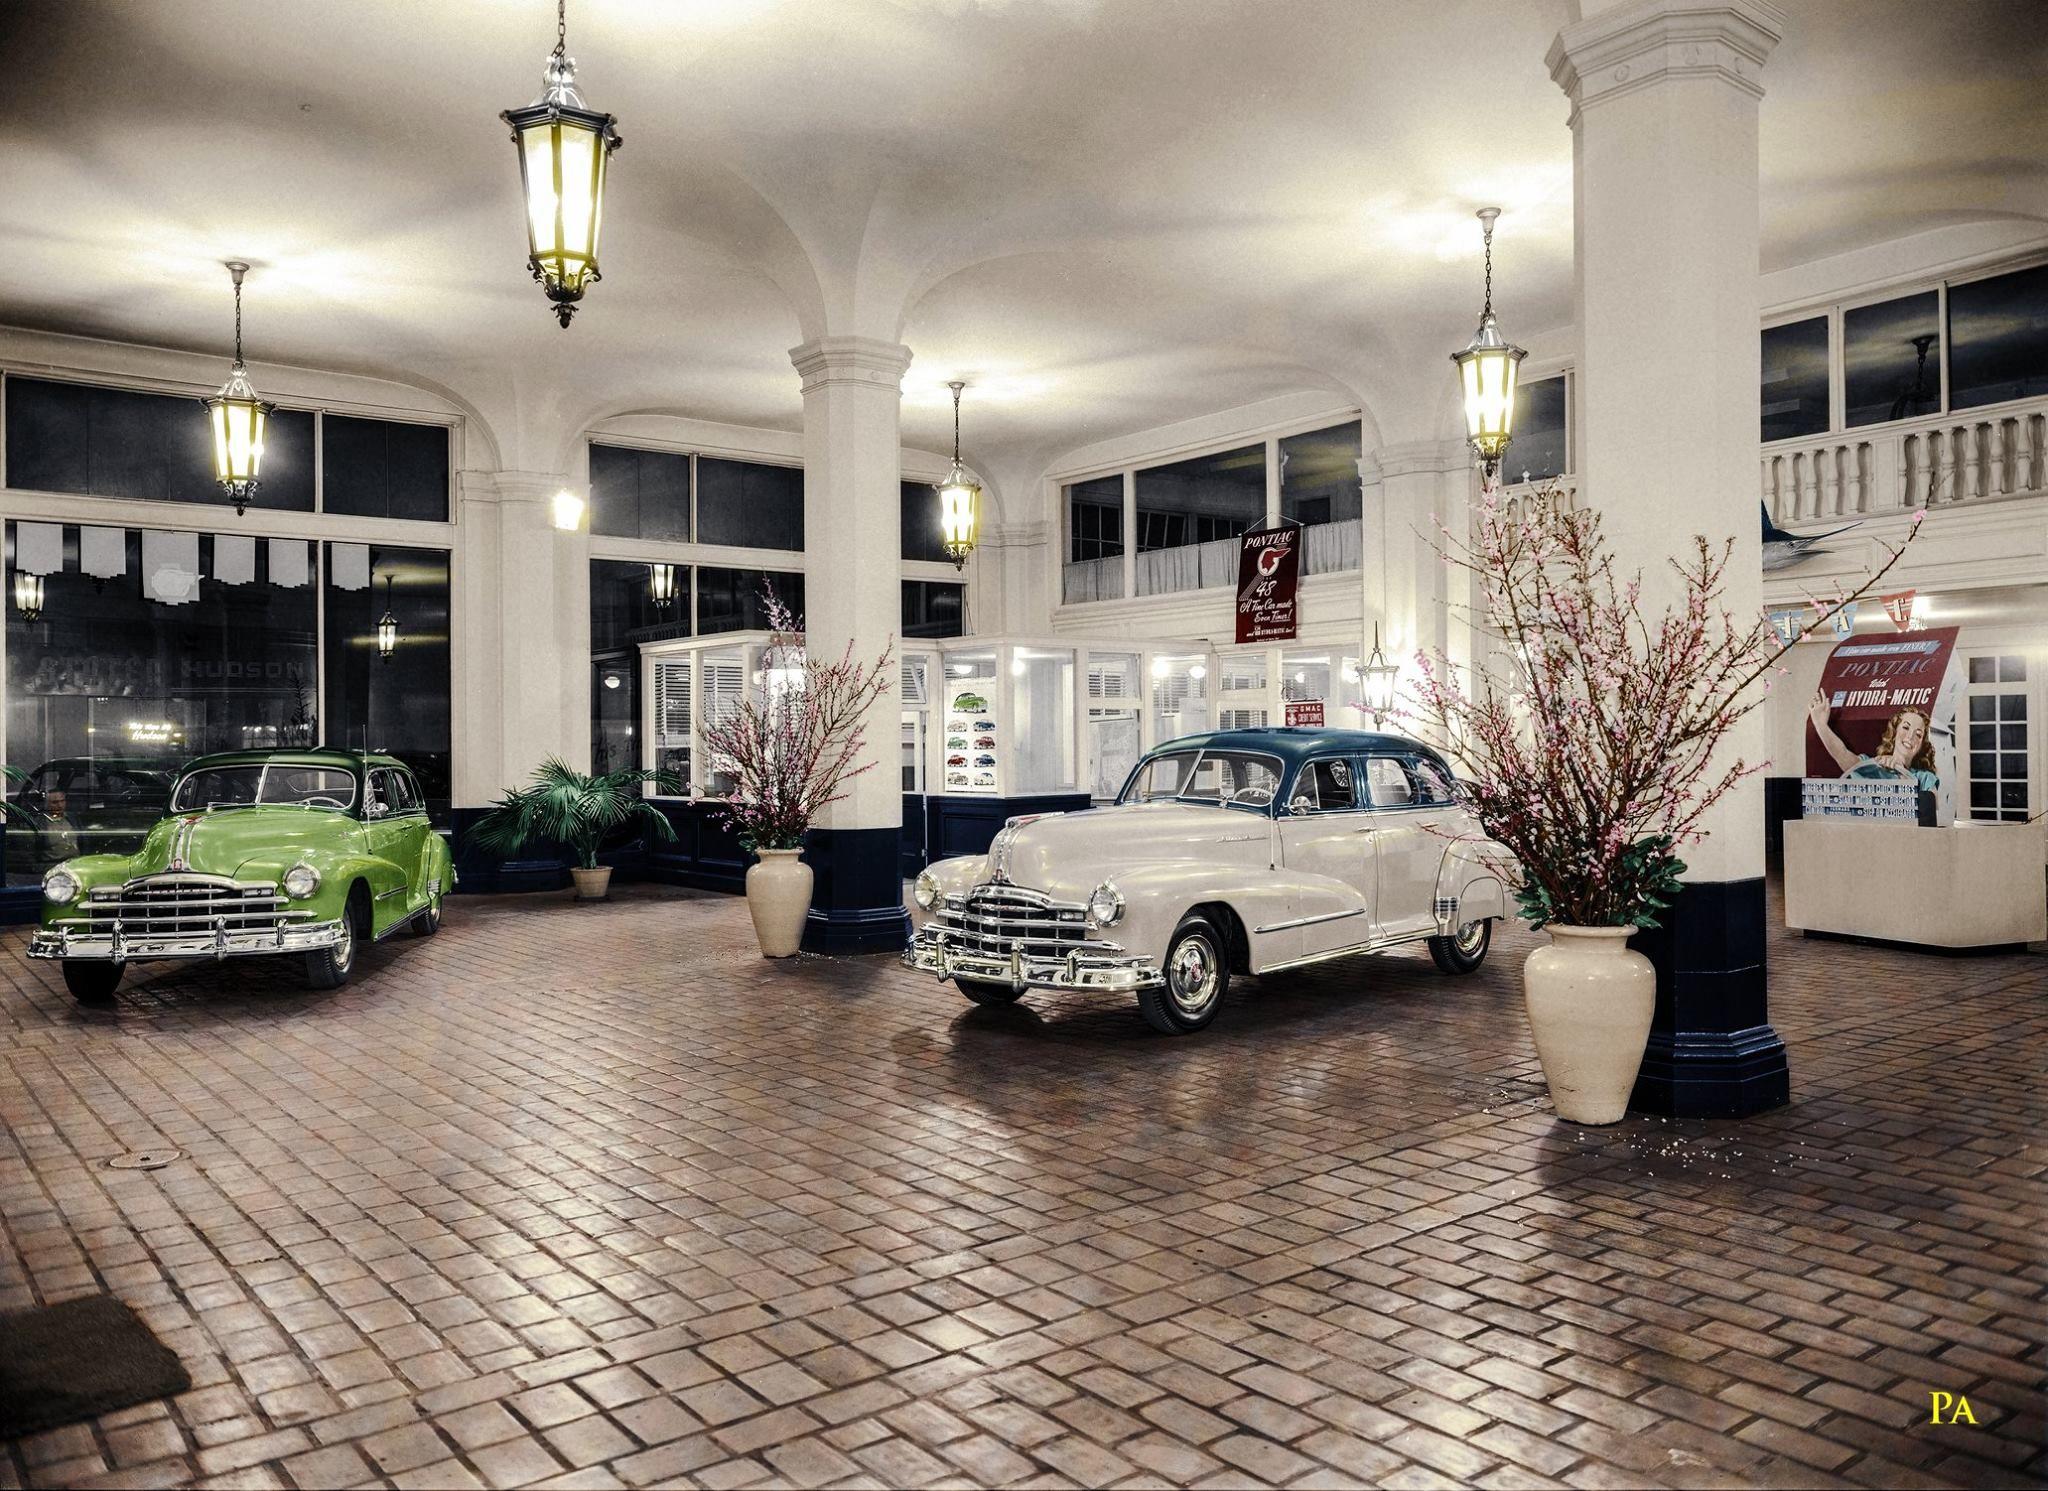 1948 Pontiac Showroom Van Ness Avenue San Francisco Pontiac Car